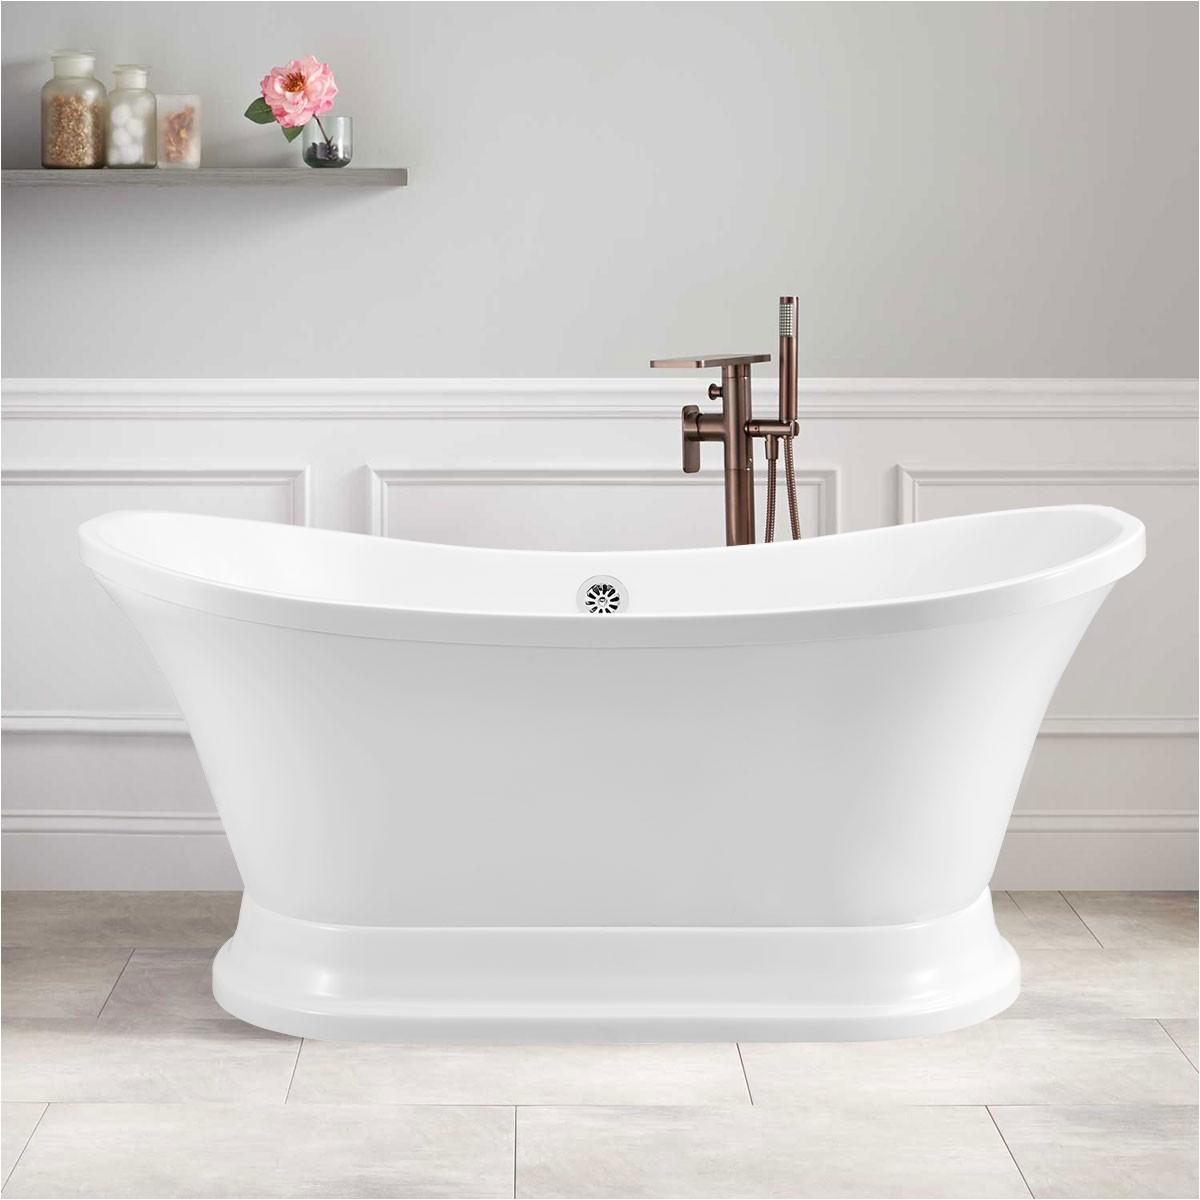 Acrylic Bathtubs Canada 60 In Freestanding Bathtub Acrylic Pure White Dk Pw